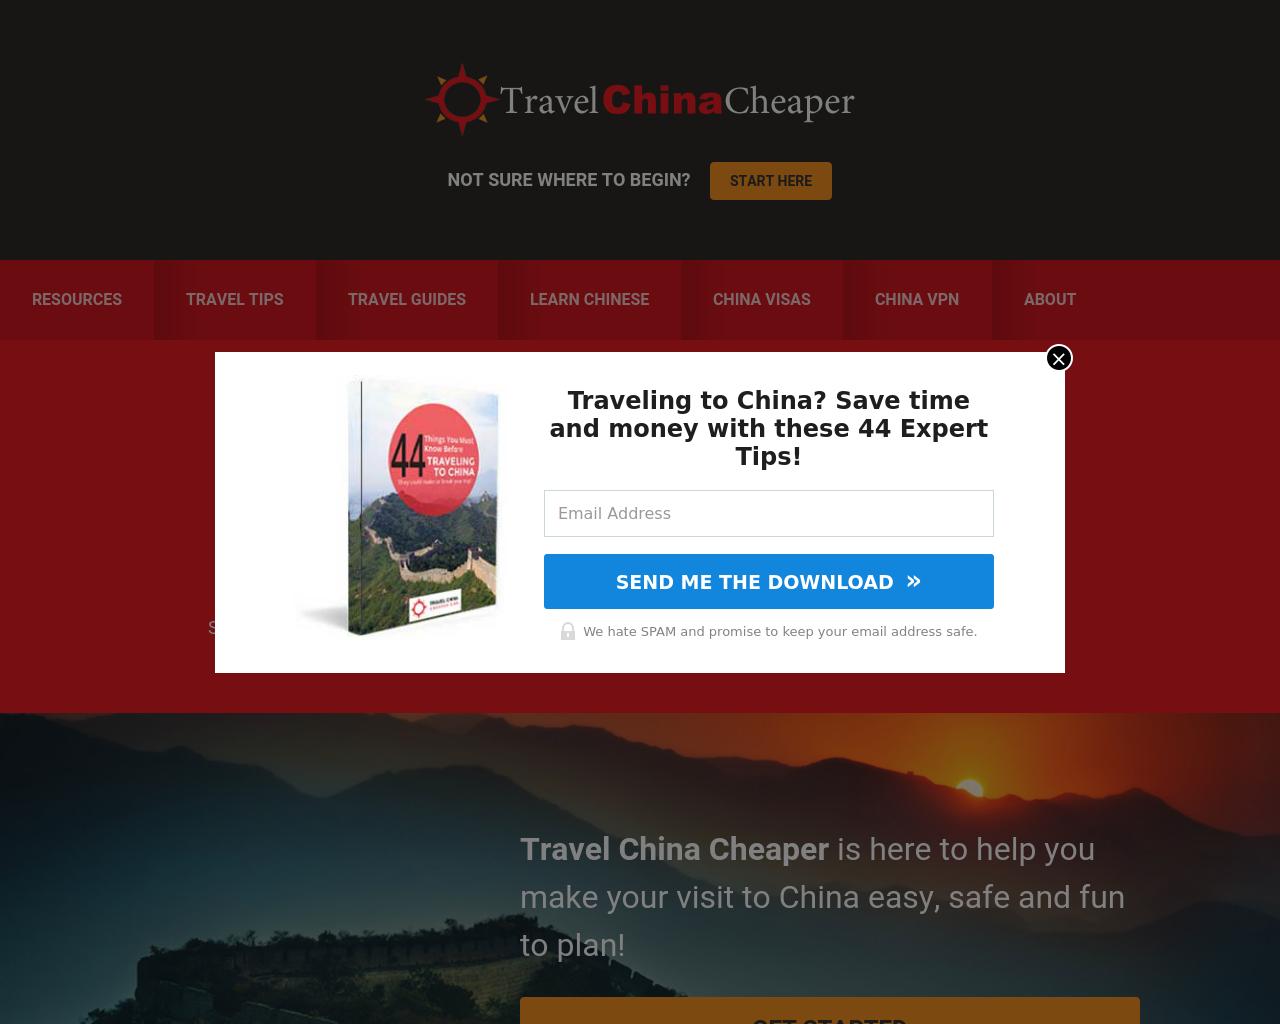 Travel-China-Cheaper-Advertising-Reviews-Pricing